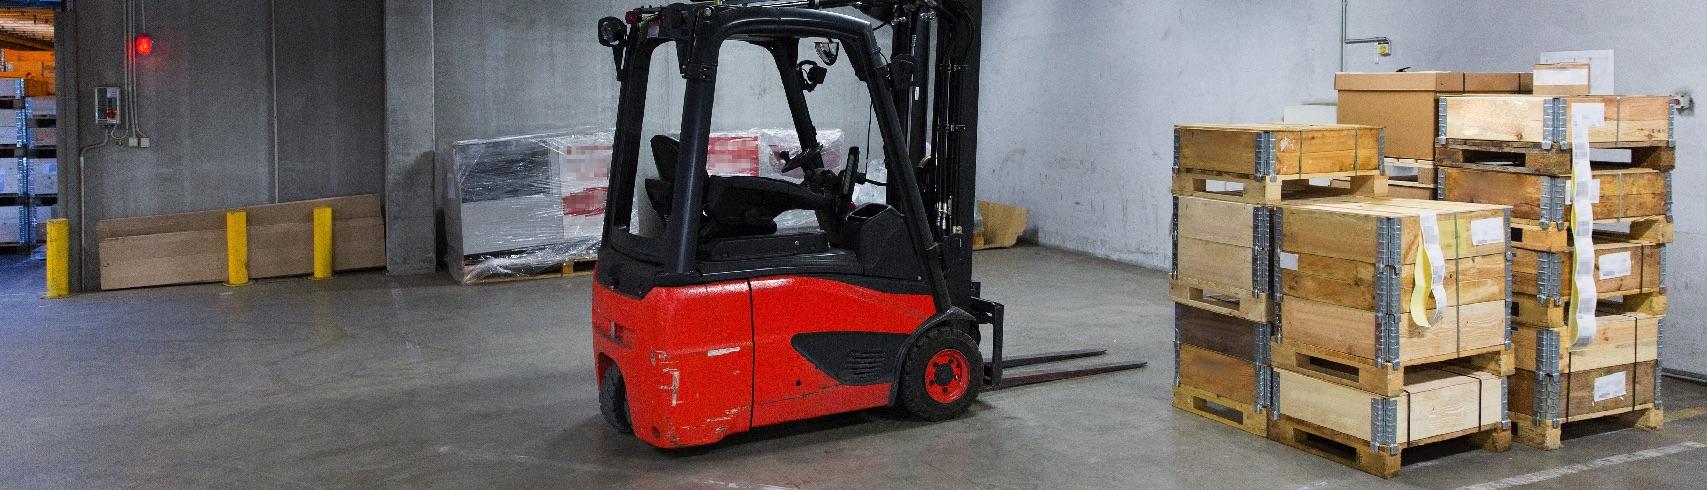 Forklift Rental Fort Worth, TX - Tobly Equipment Rental